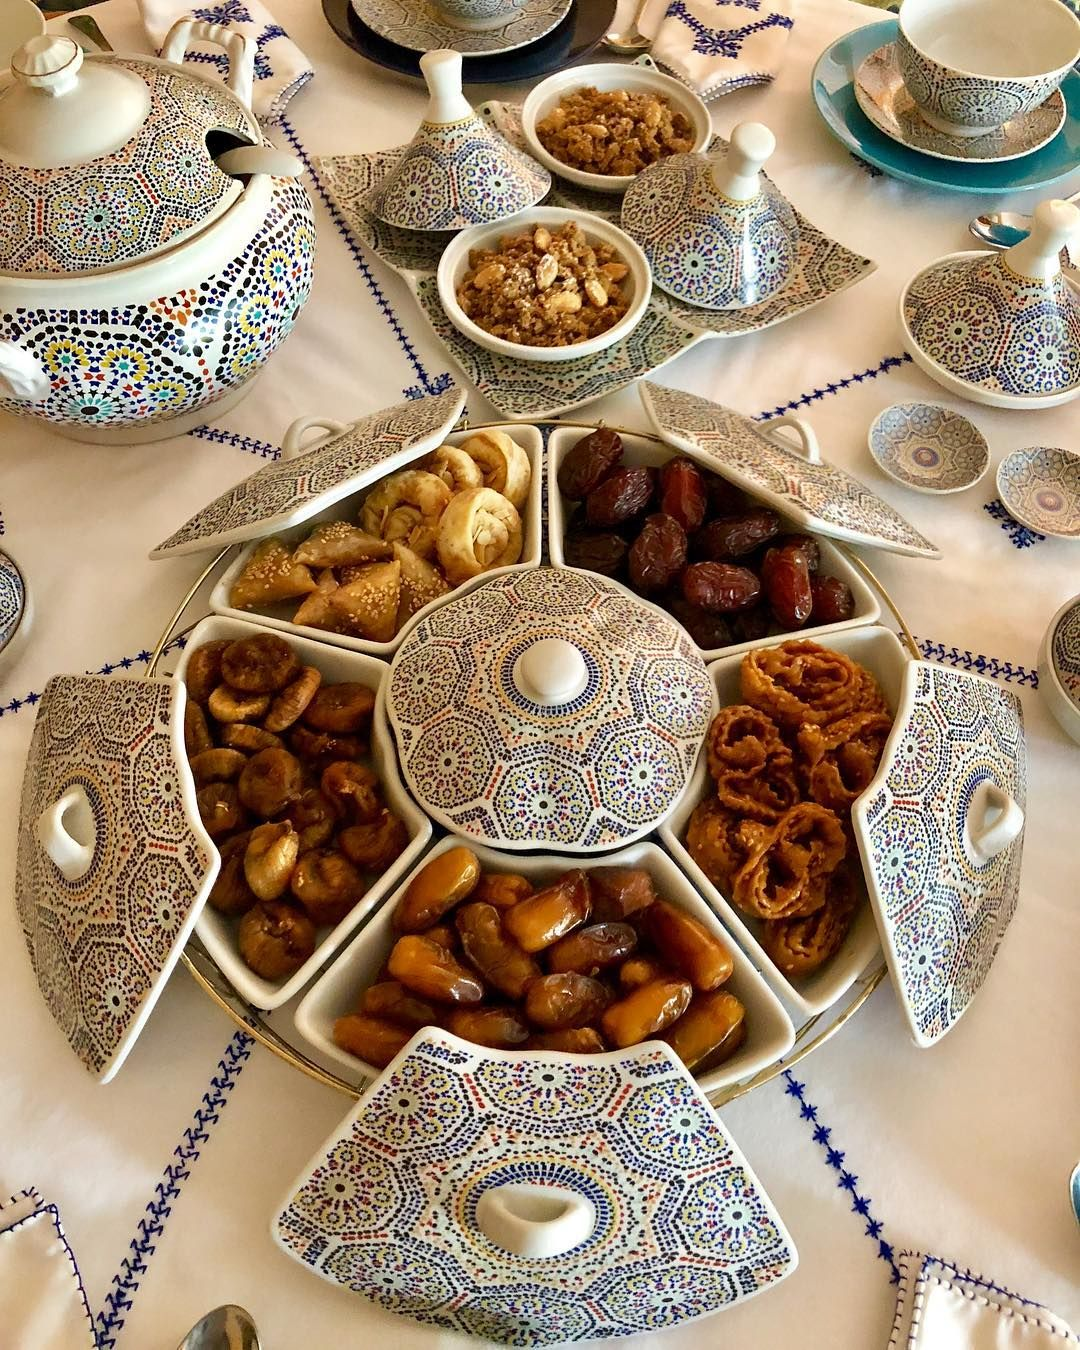 Petit Dejeuner Marocain Gouter Marocain Gouter A La Marocaine Presentation A La Marocaine Moroccan Food Morrocan Food Moroccan Cooking Moroccan Breakfast